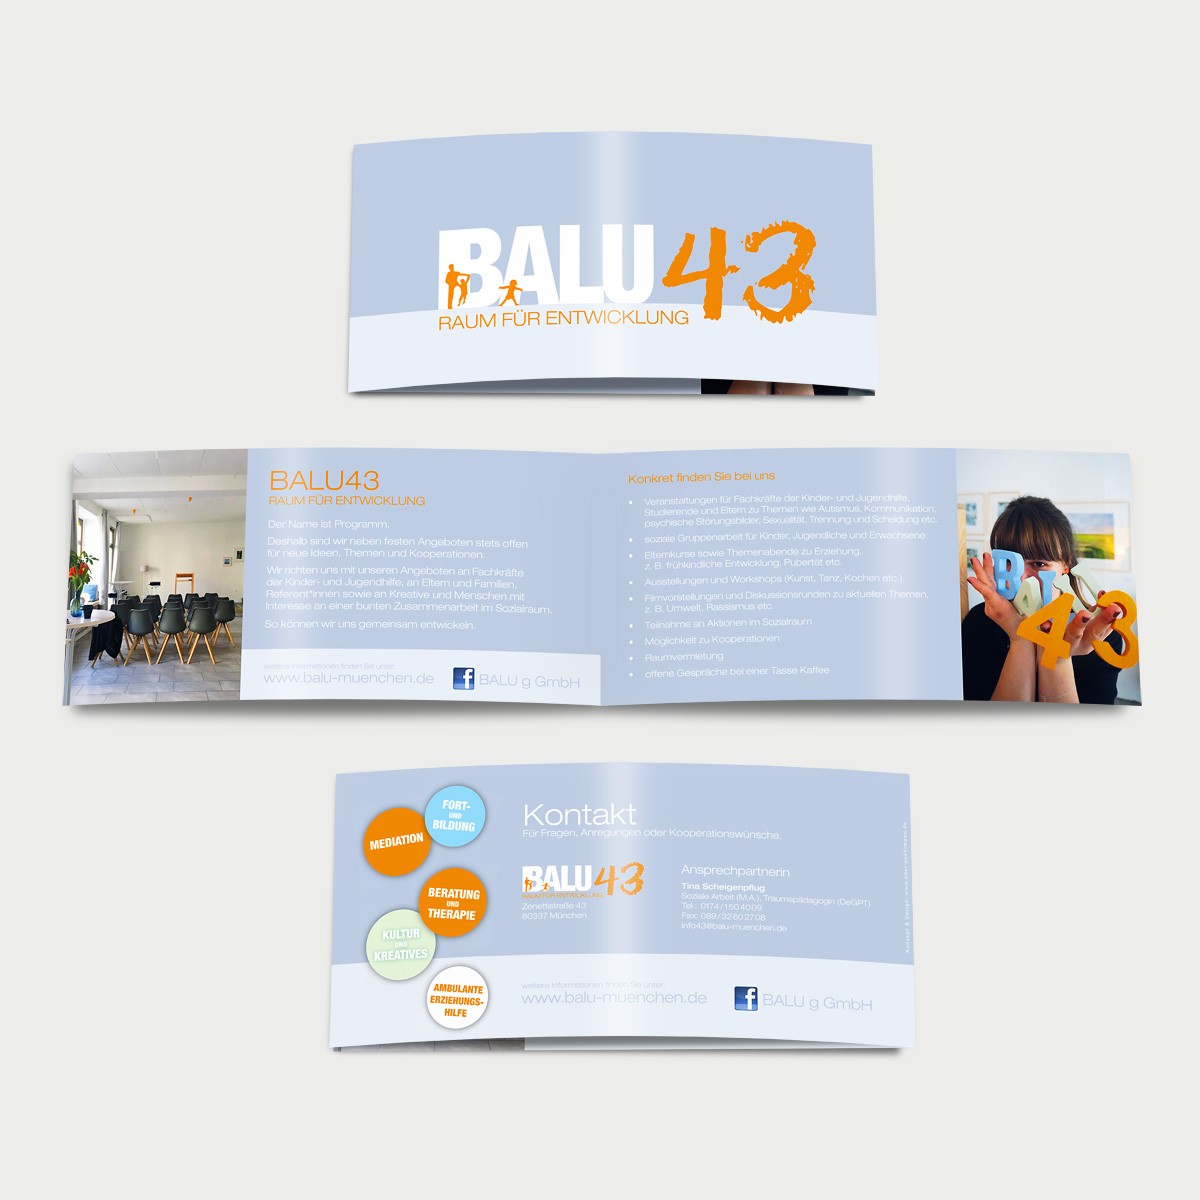 Balu-43-Muenchen-Folder